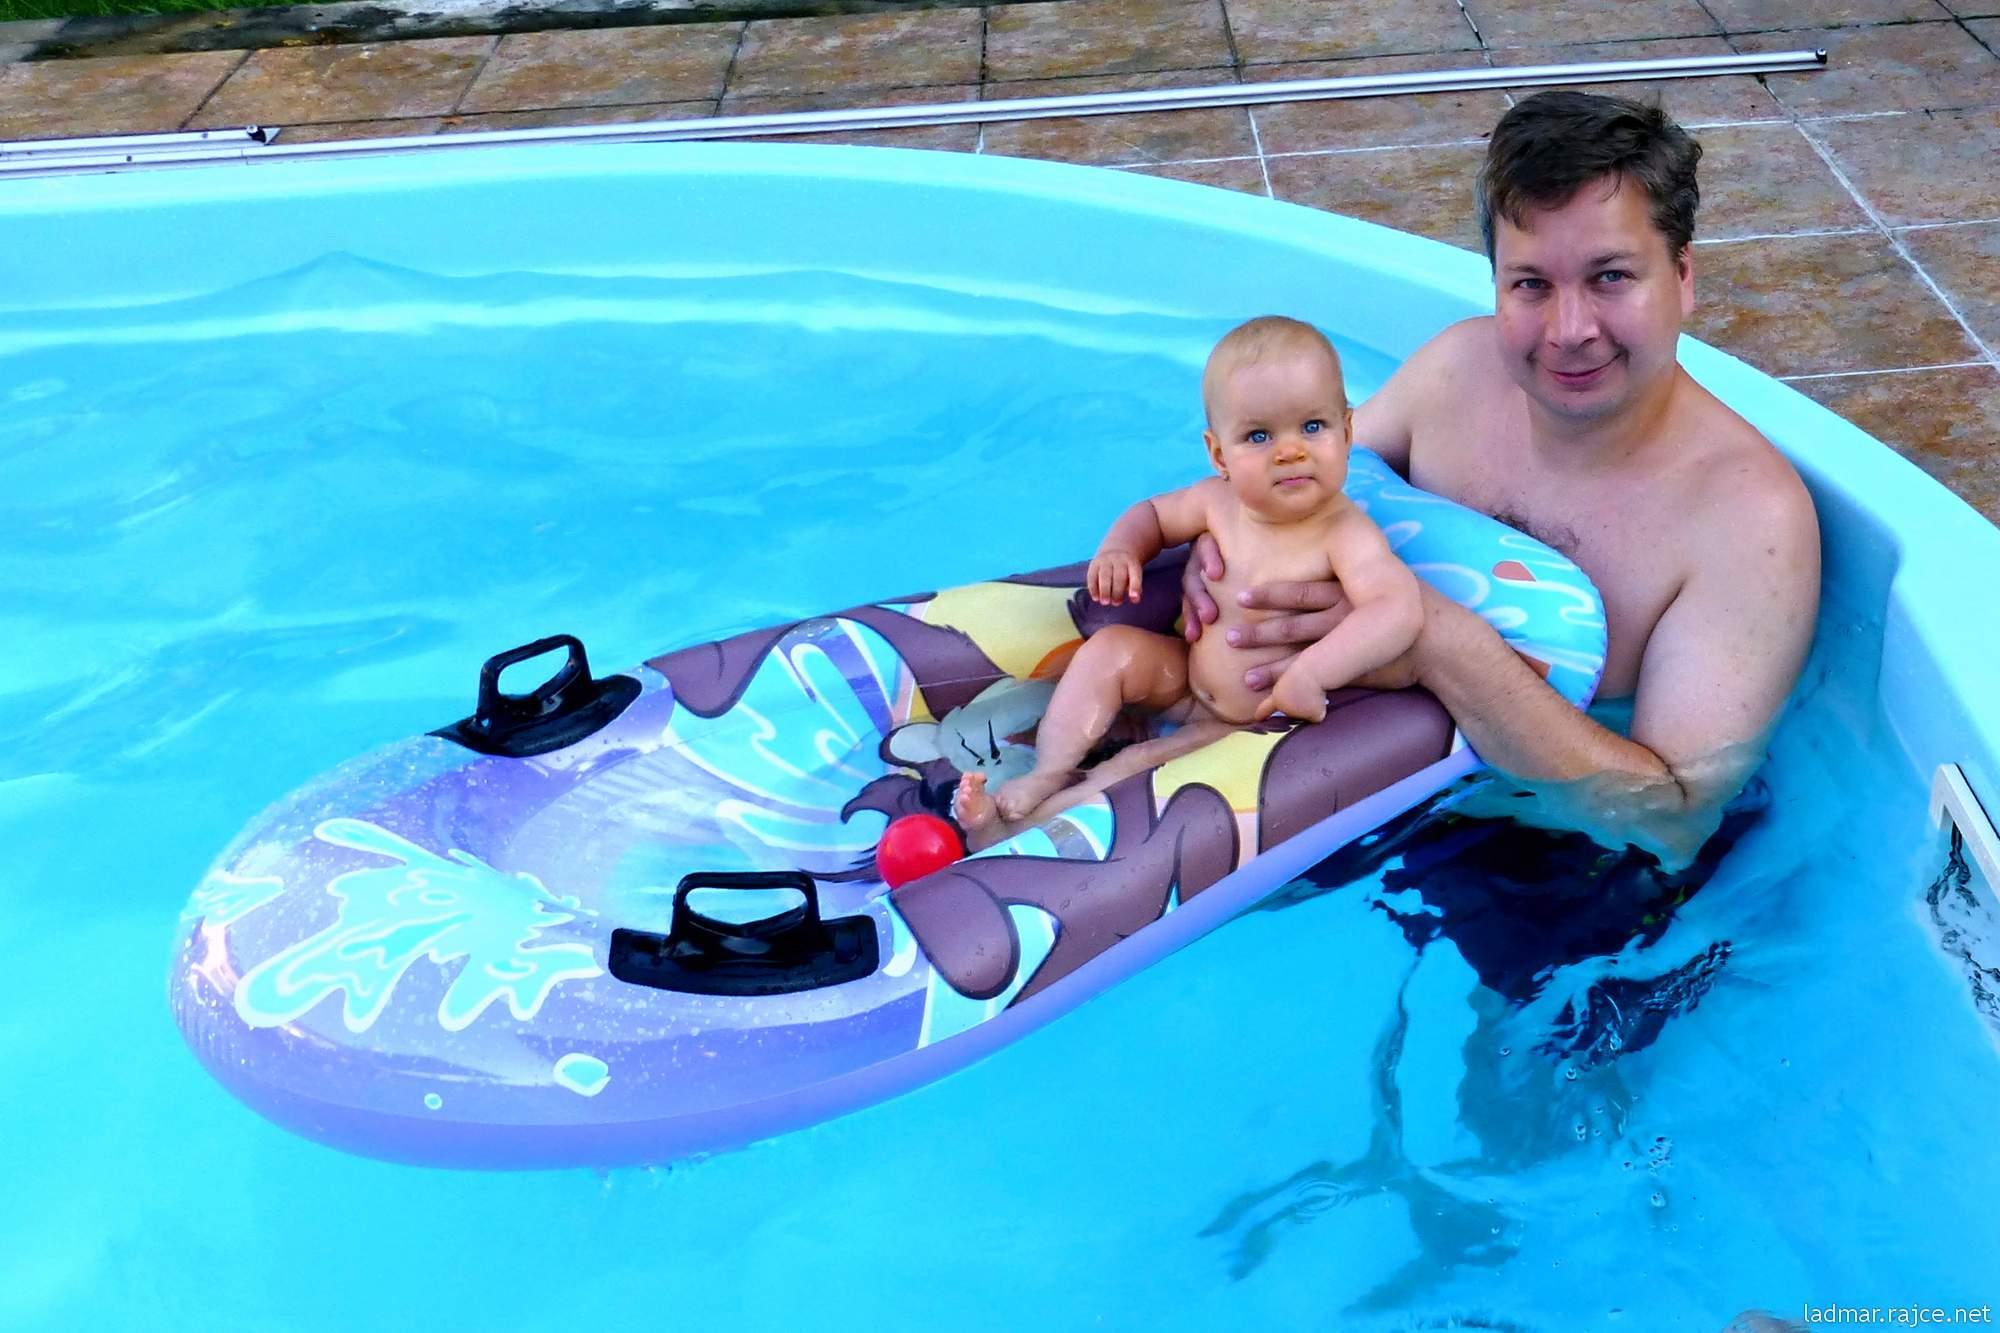 dete rajce.idnes. pool Pool Party – paskerov – album na Rajčeti